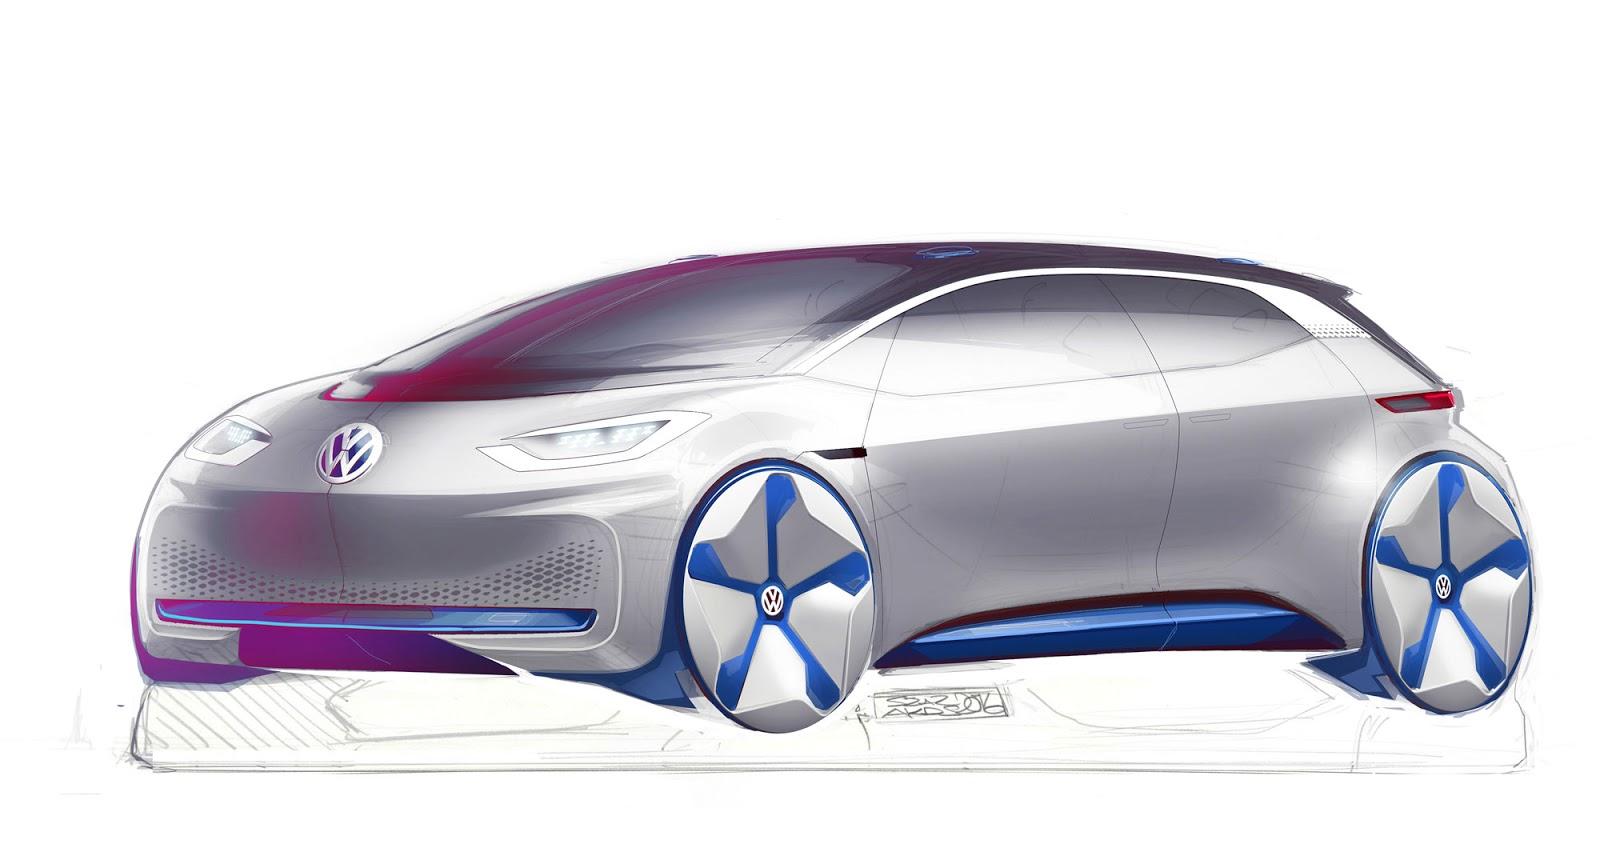 Volkswagen ID sketch by Akos Szaz